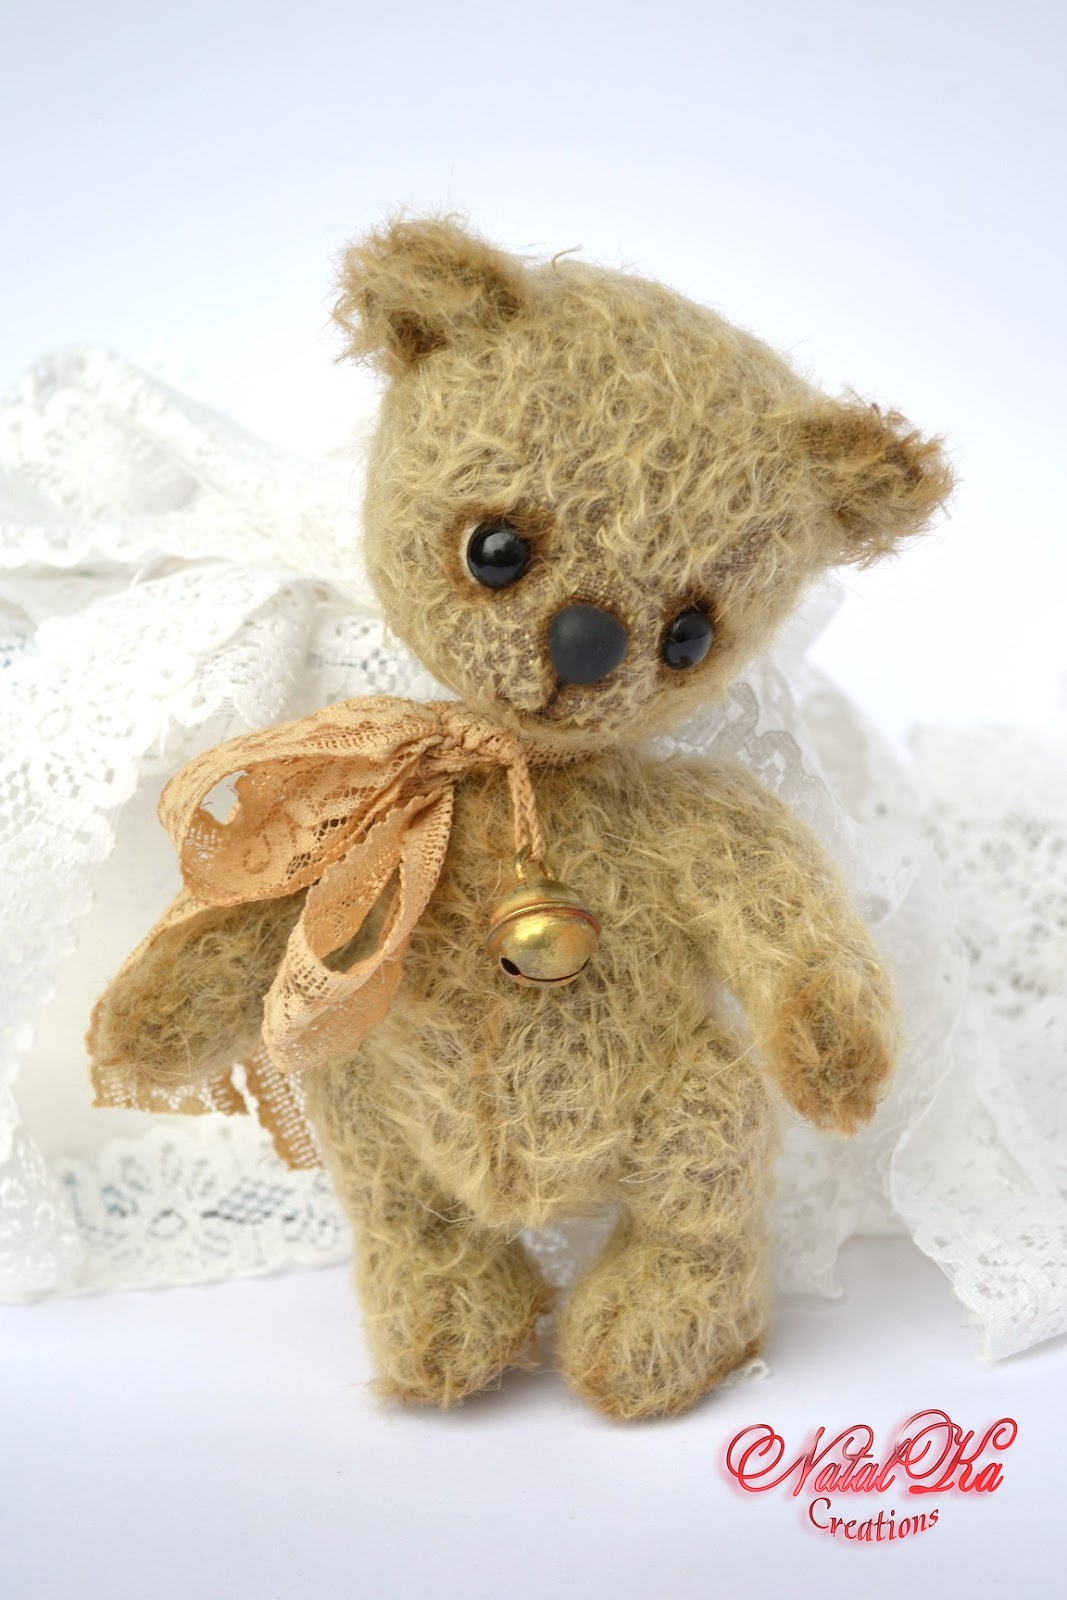 Artist teddy bear ooak mohair handmade by NatalKa Creations. Авторский мишка тедди в единственном экземпляре ручной работы от NatalKa Creations.